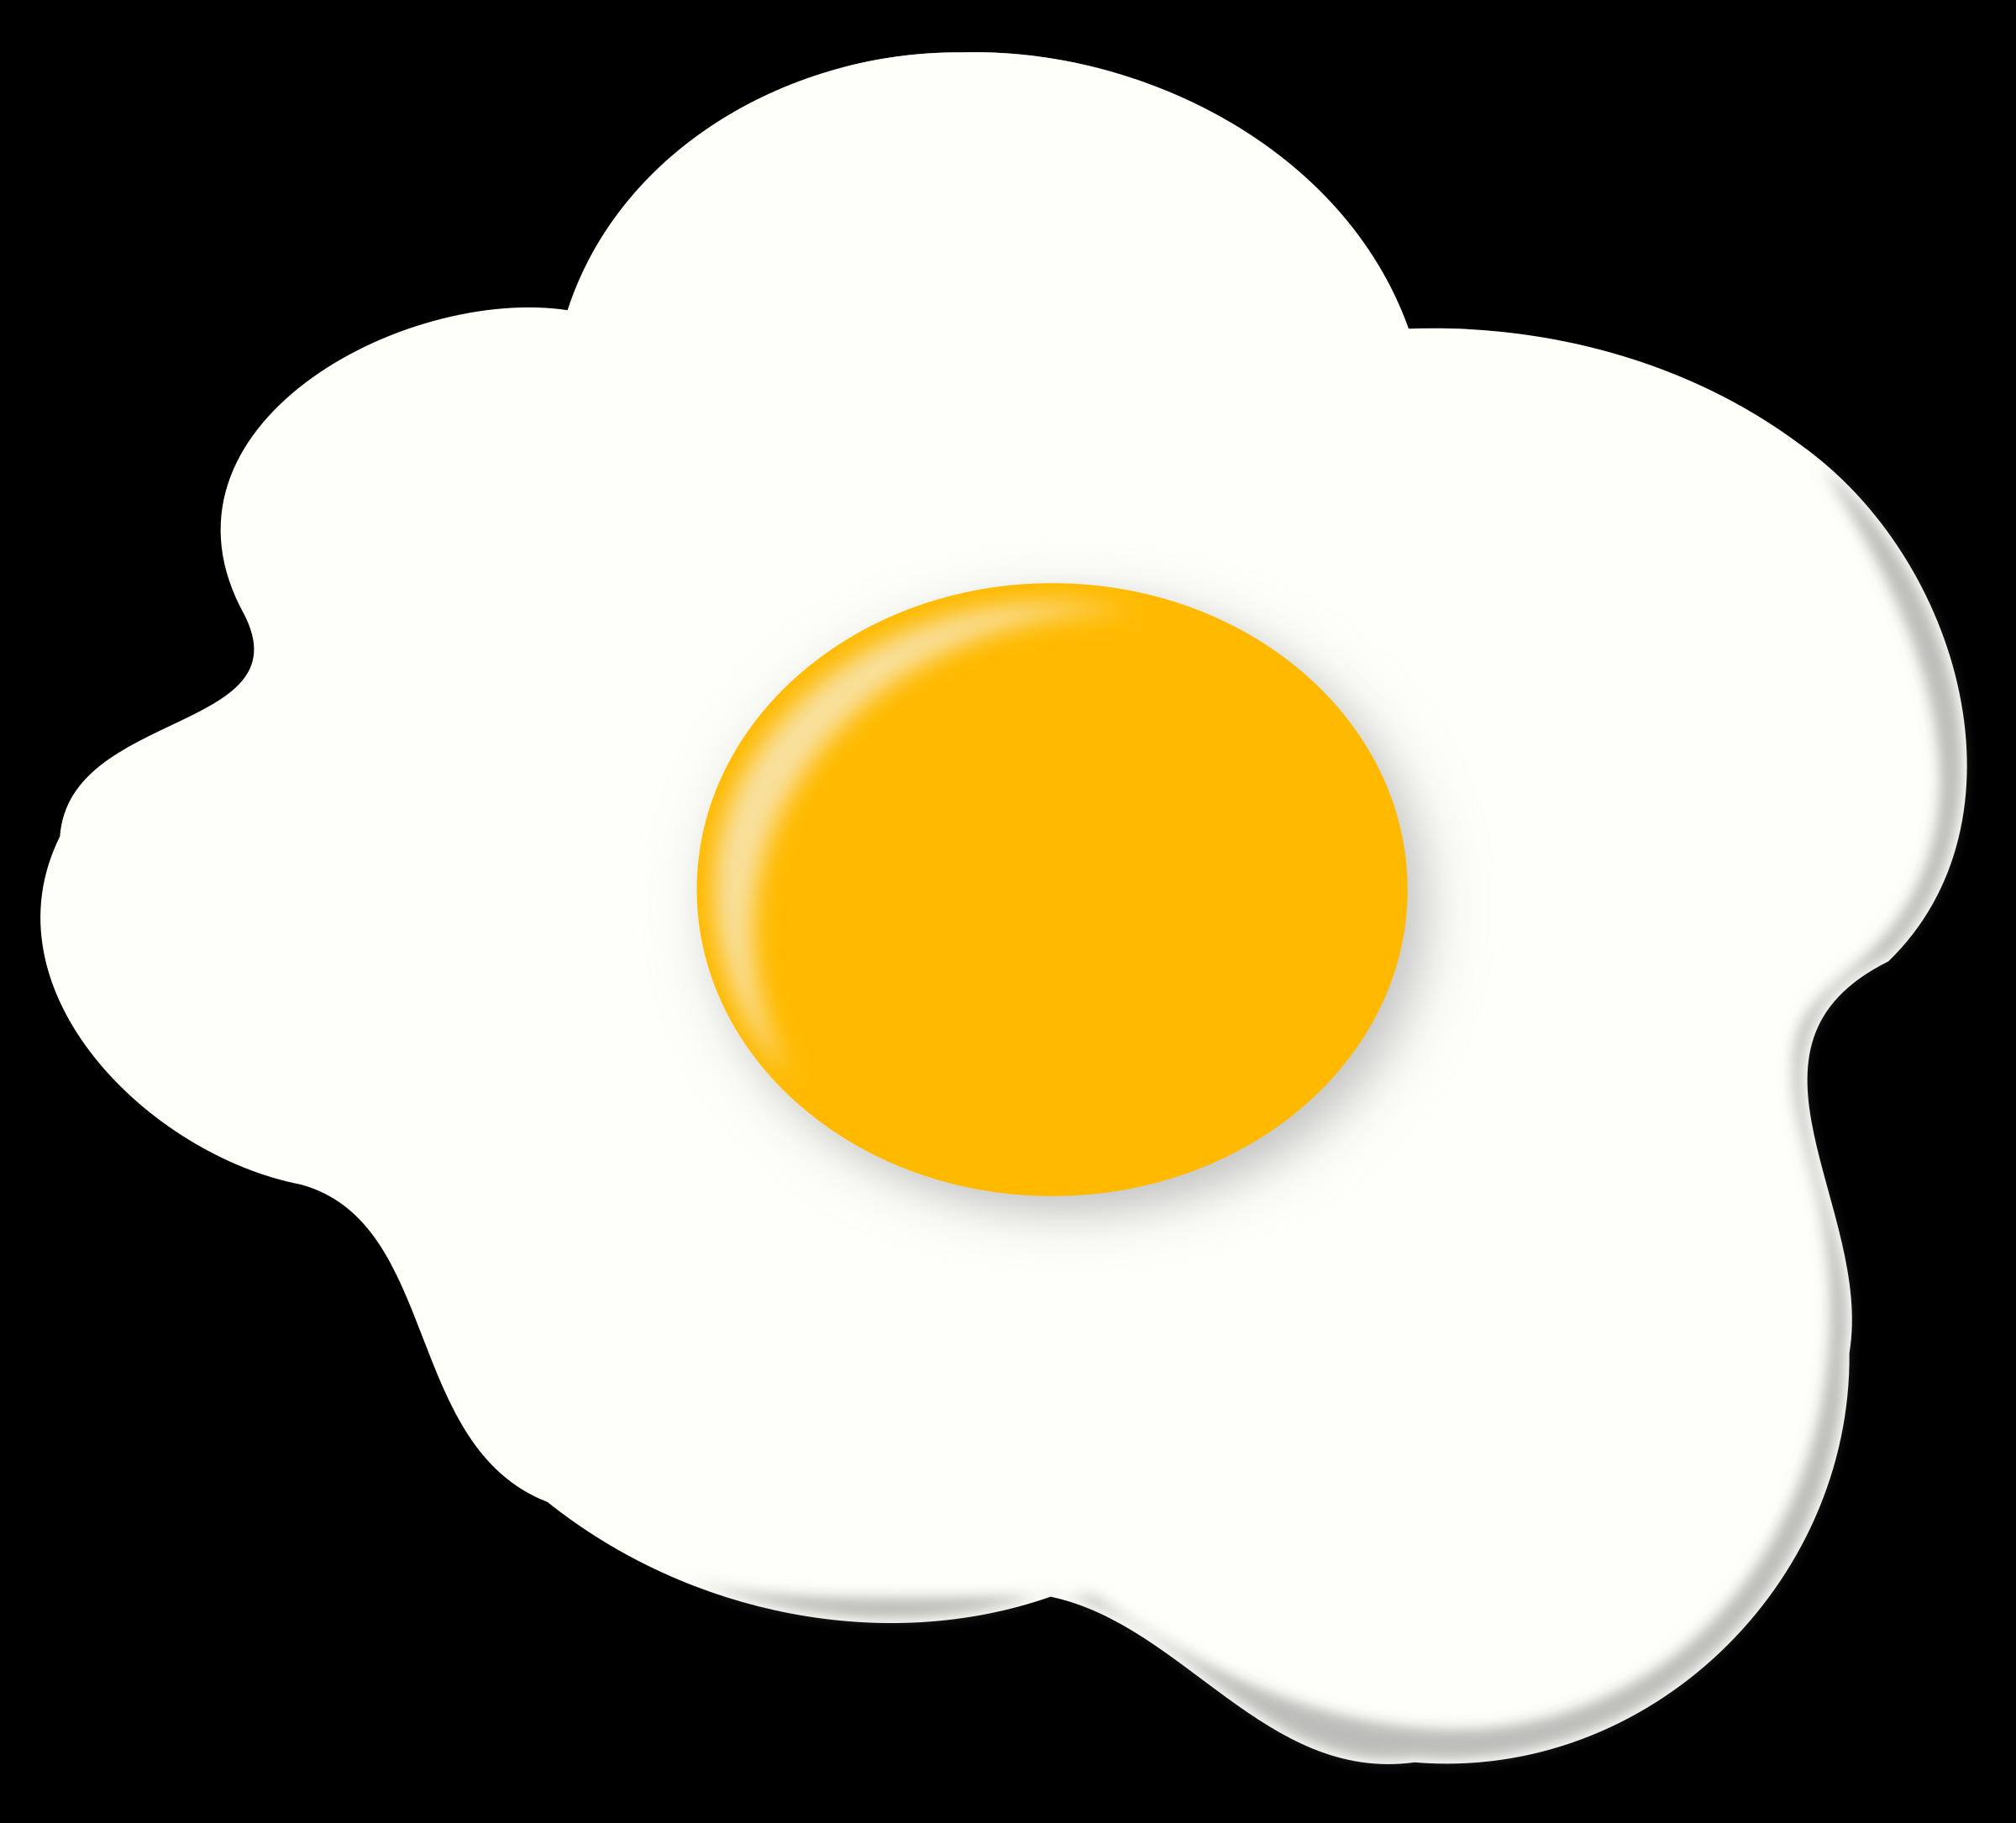 Jajko side up egg. Sunny clipart outline